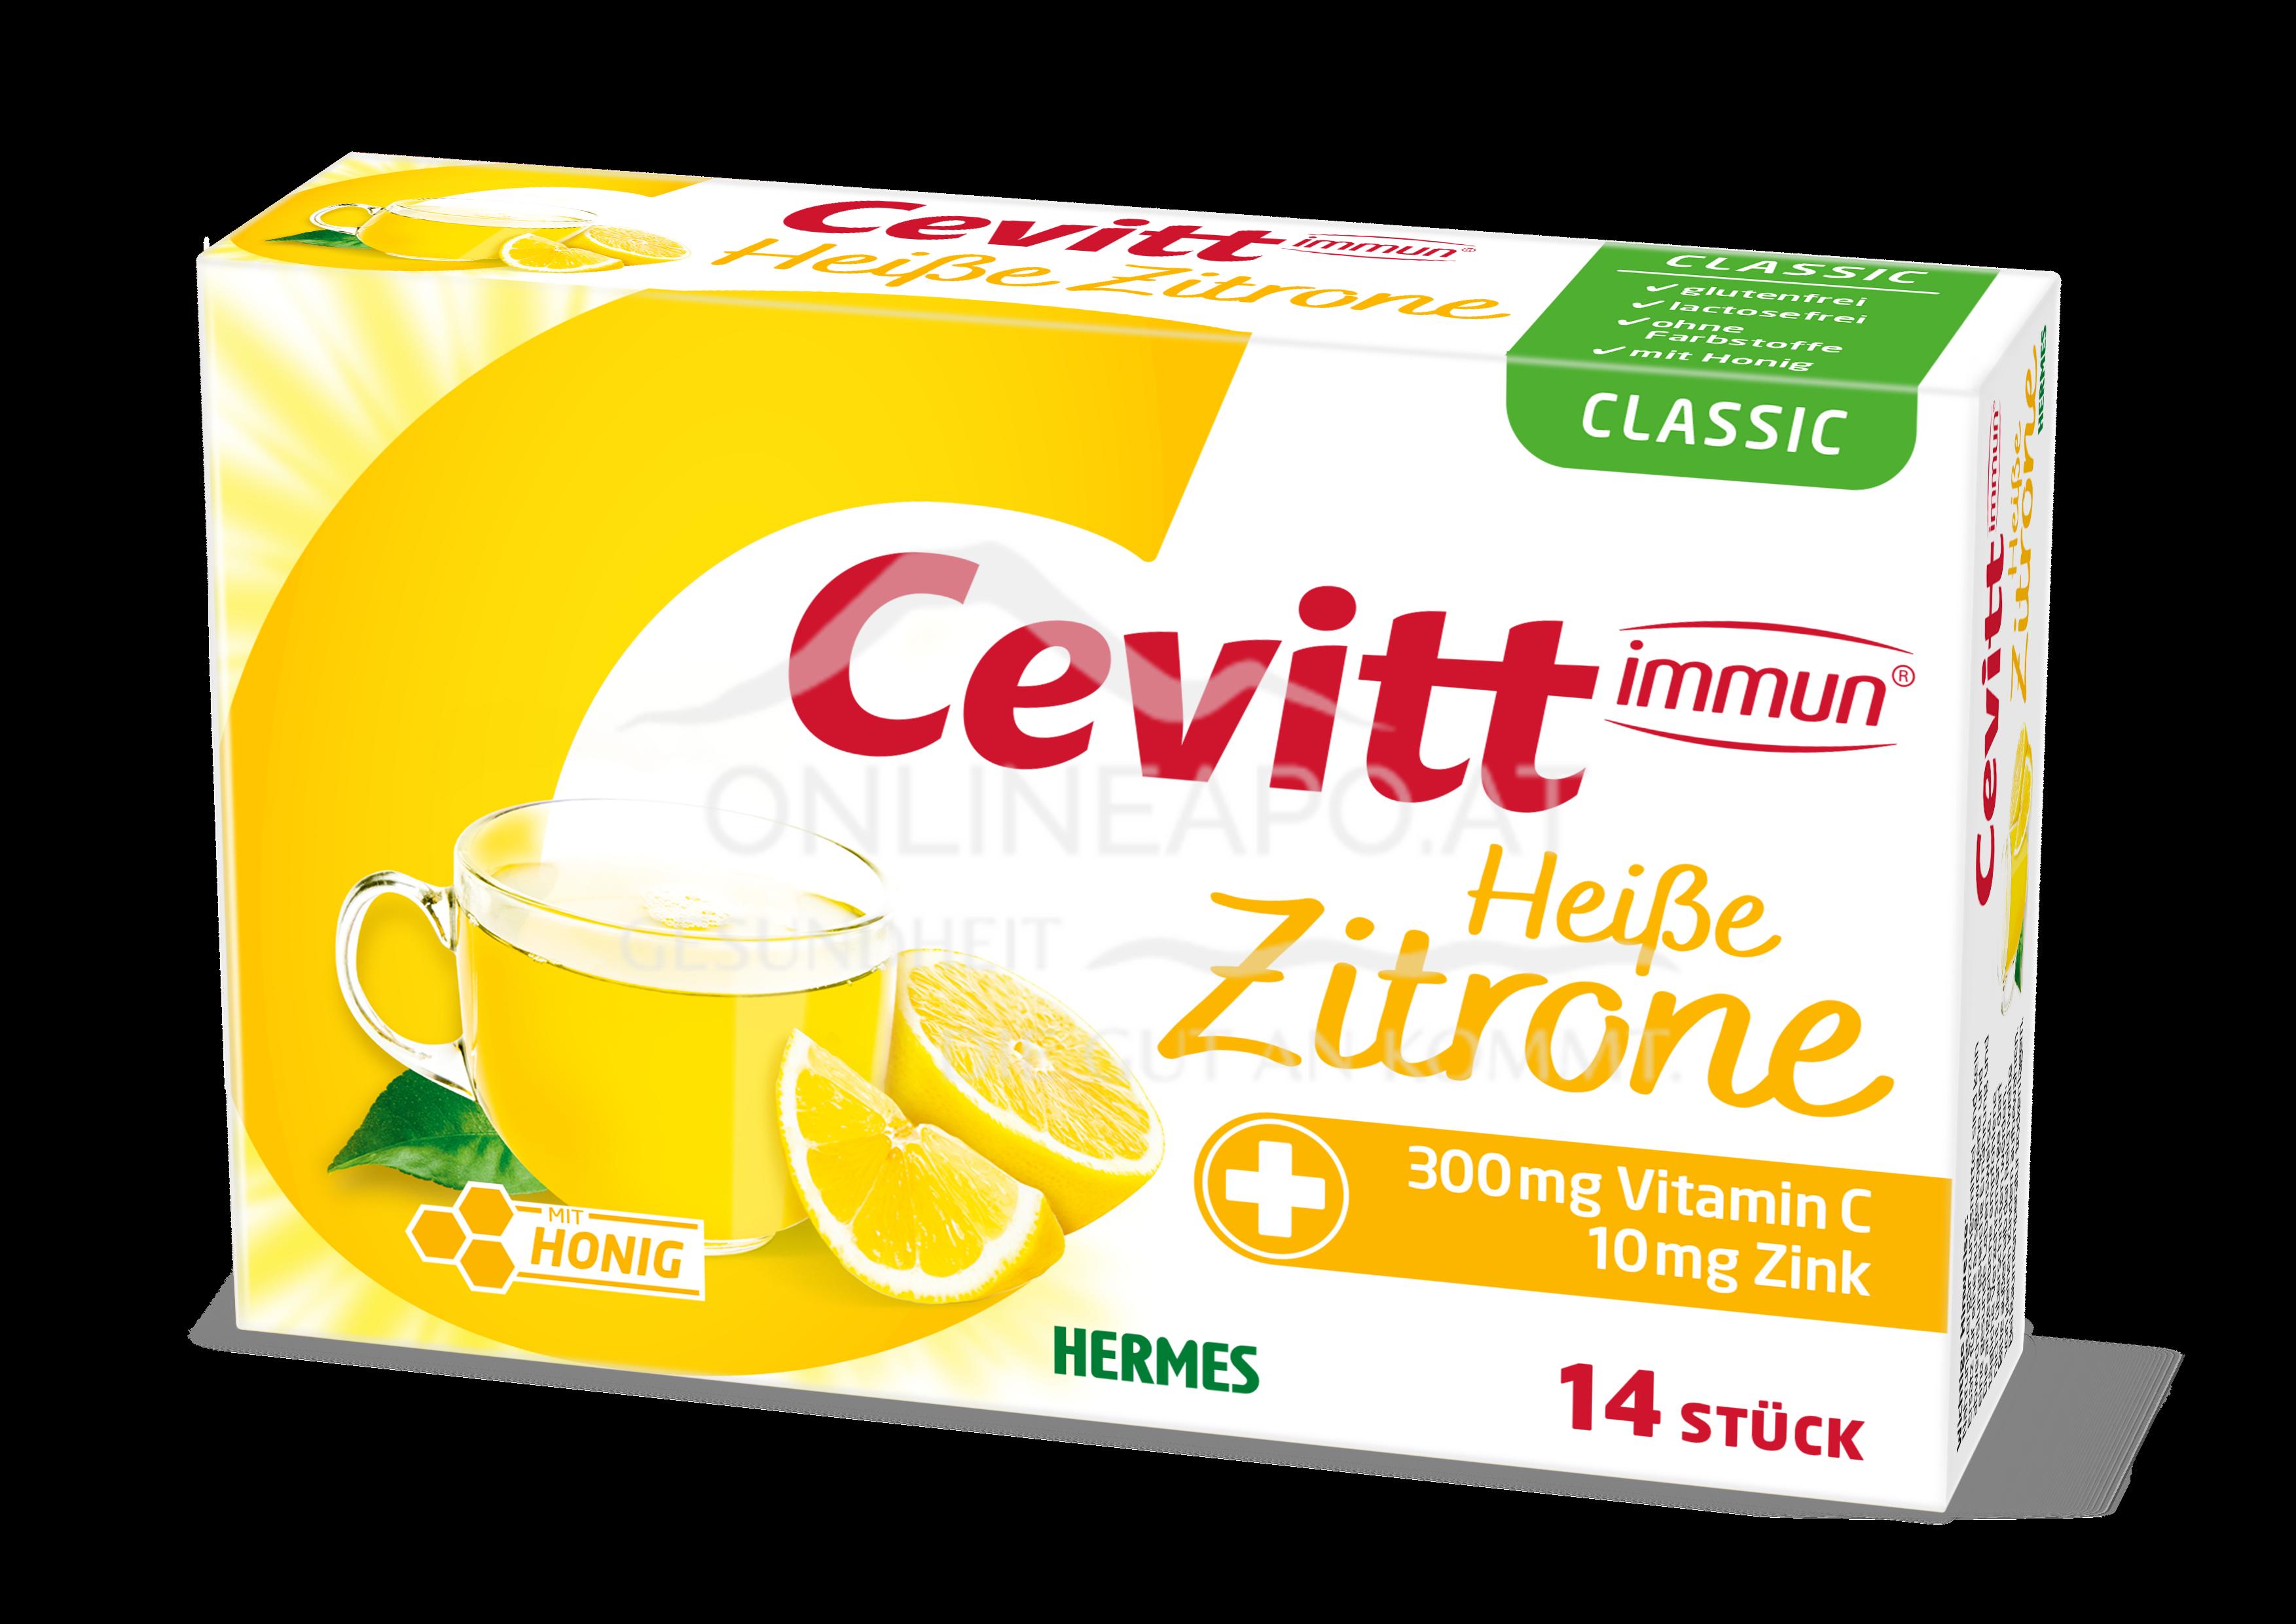 Cevitt immun® Heiße Zitrone